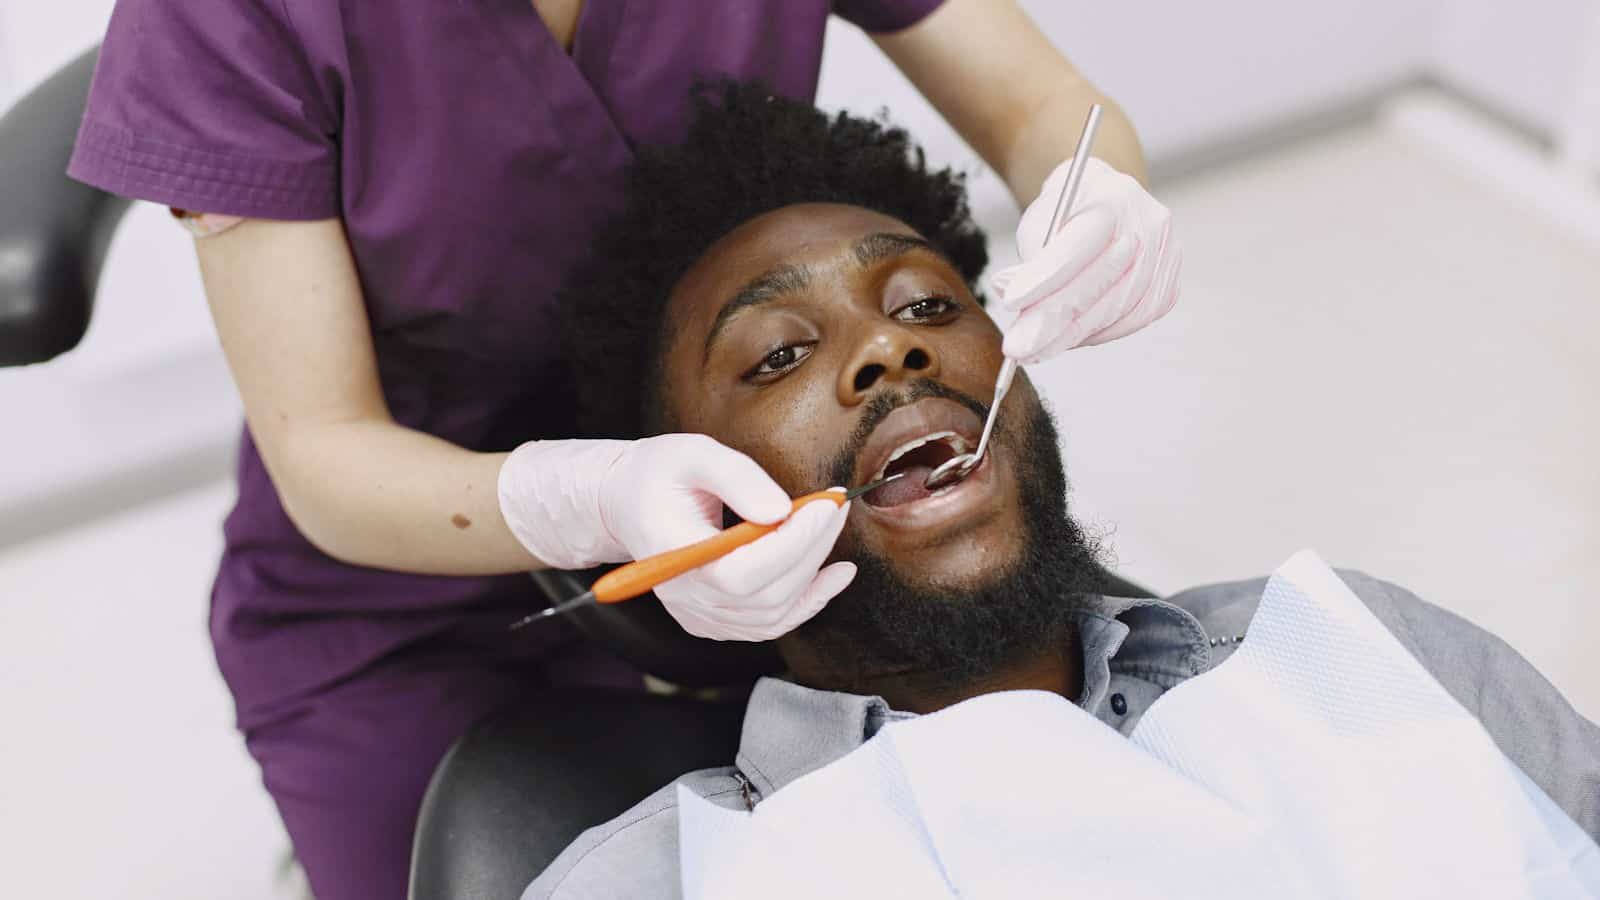 Cherry Creek Dental Arts of Denver